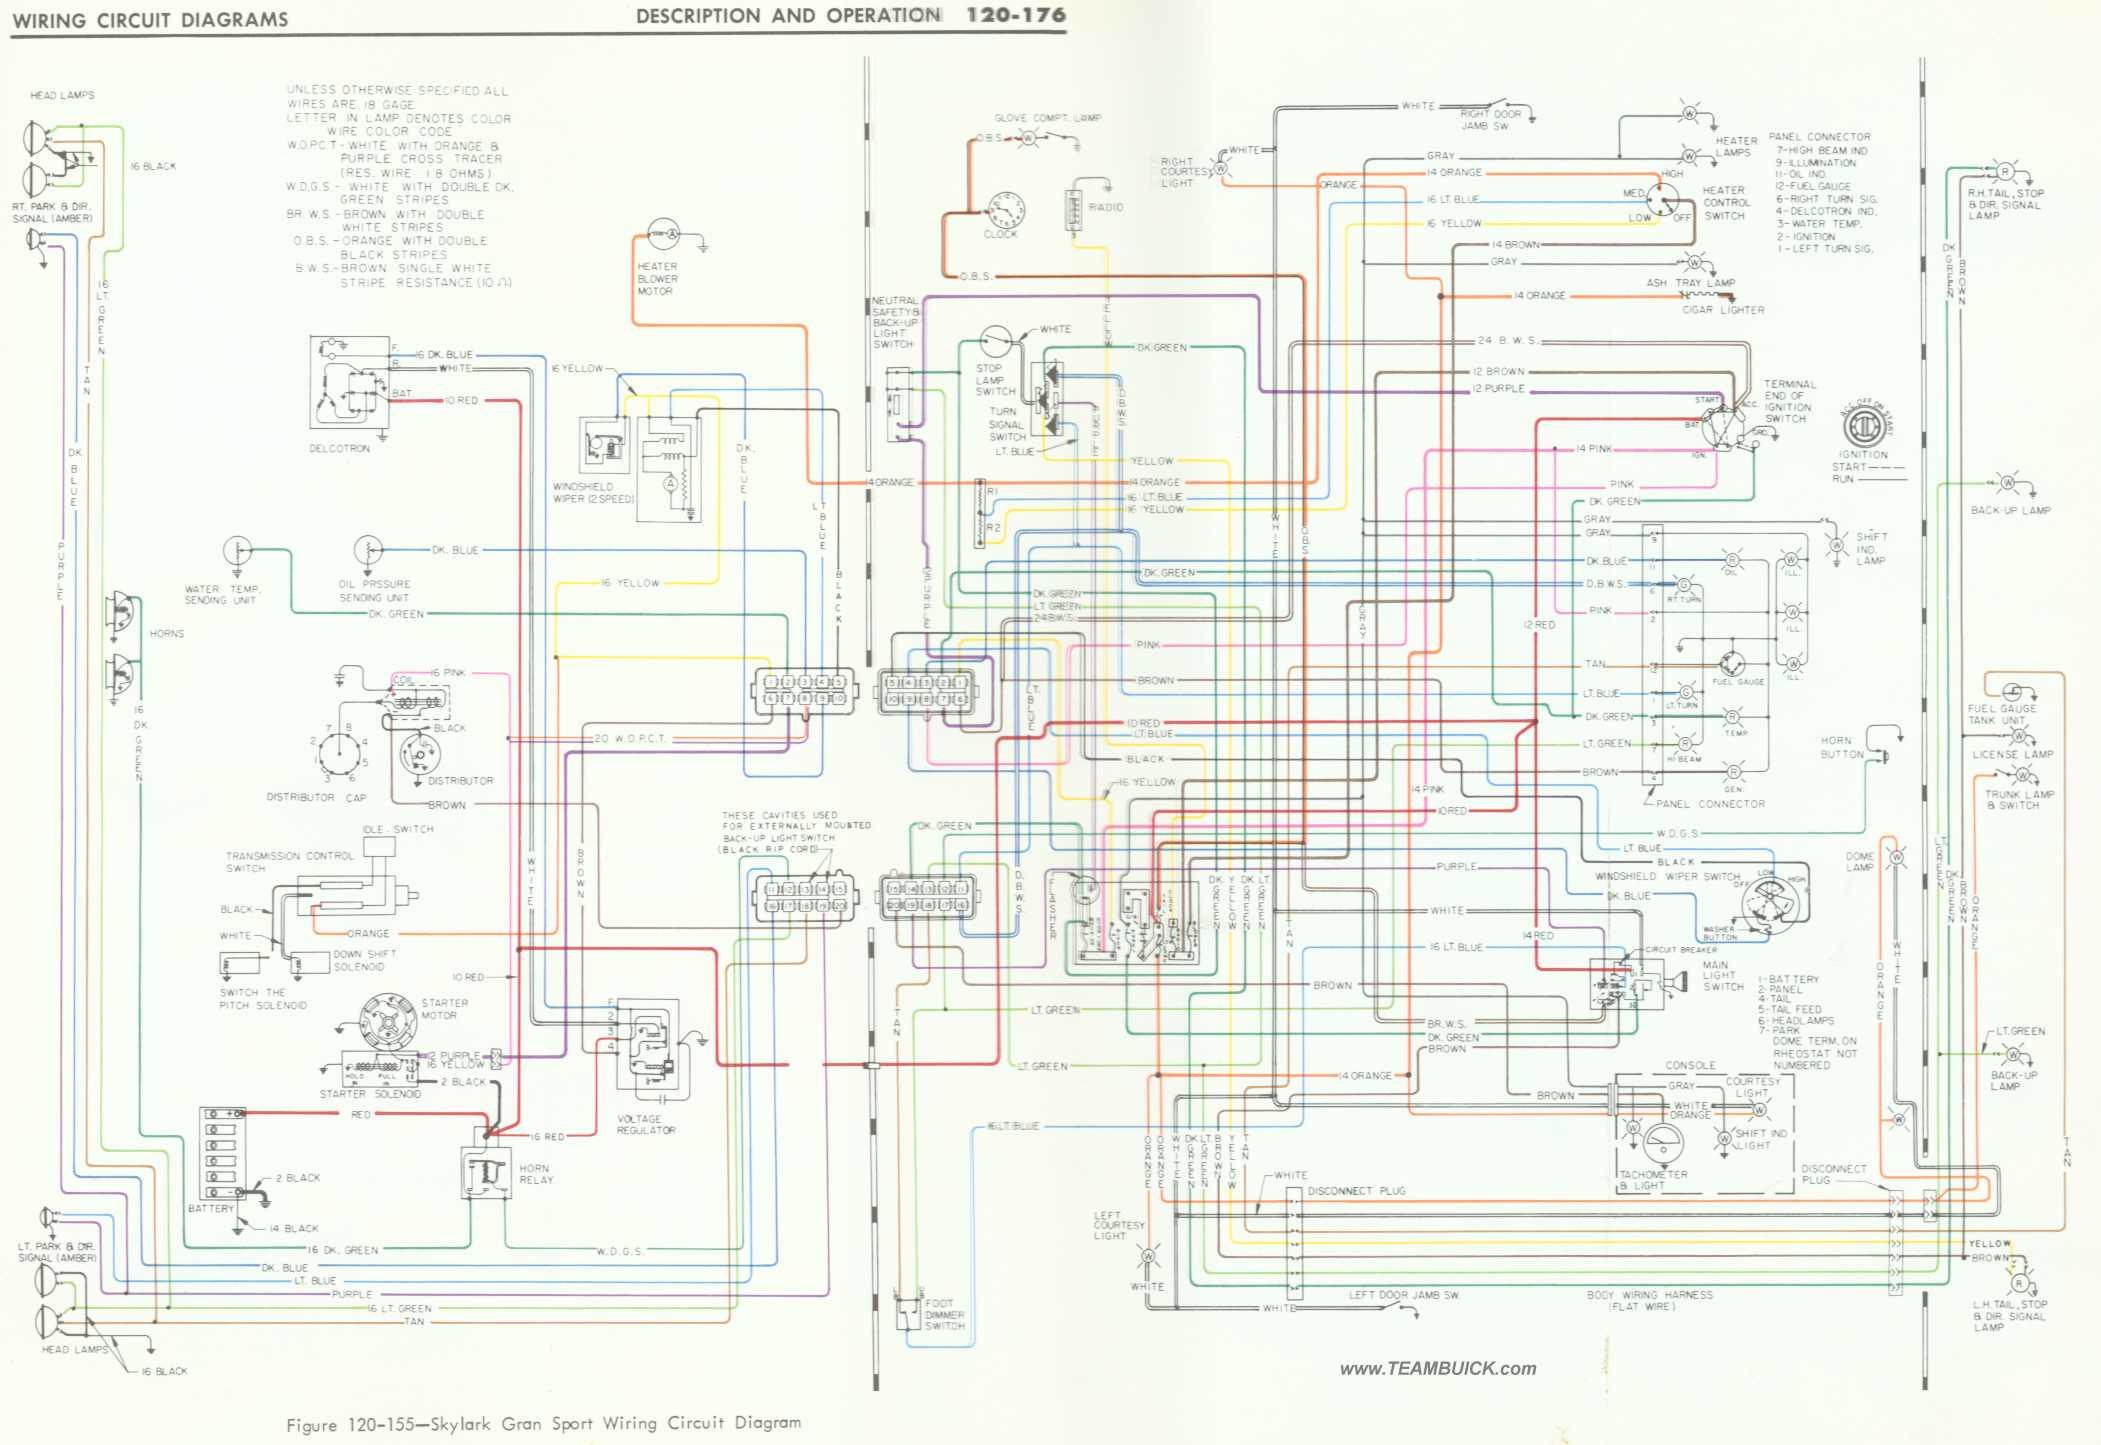 Buick Skylark Gs Wiring Diagram